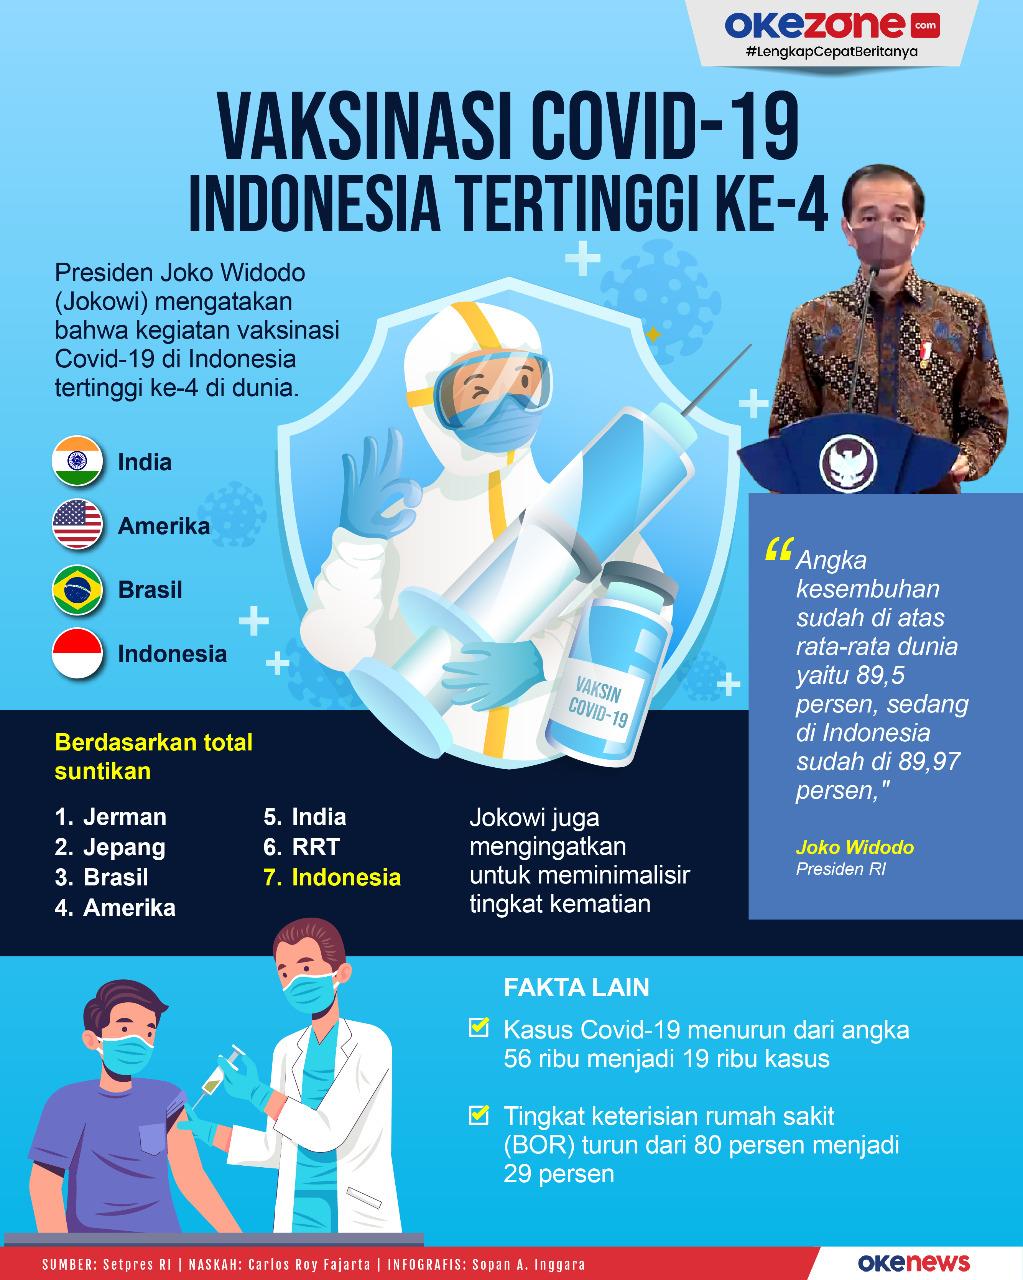 Vaksinasi Covid-19 Indonesia Tertinggi Keempat dari 220 Negara -